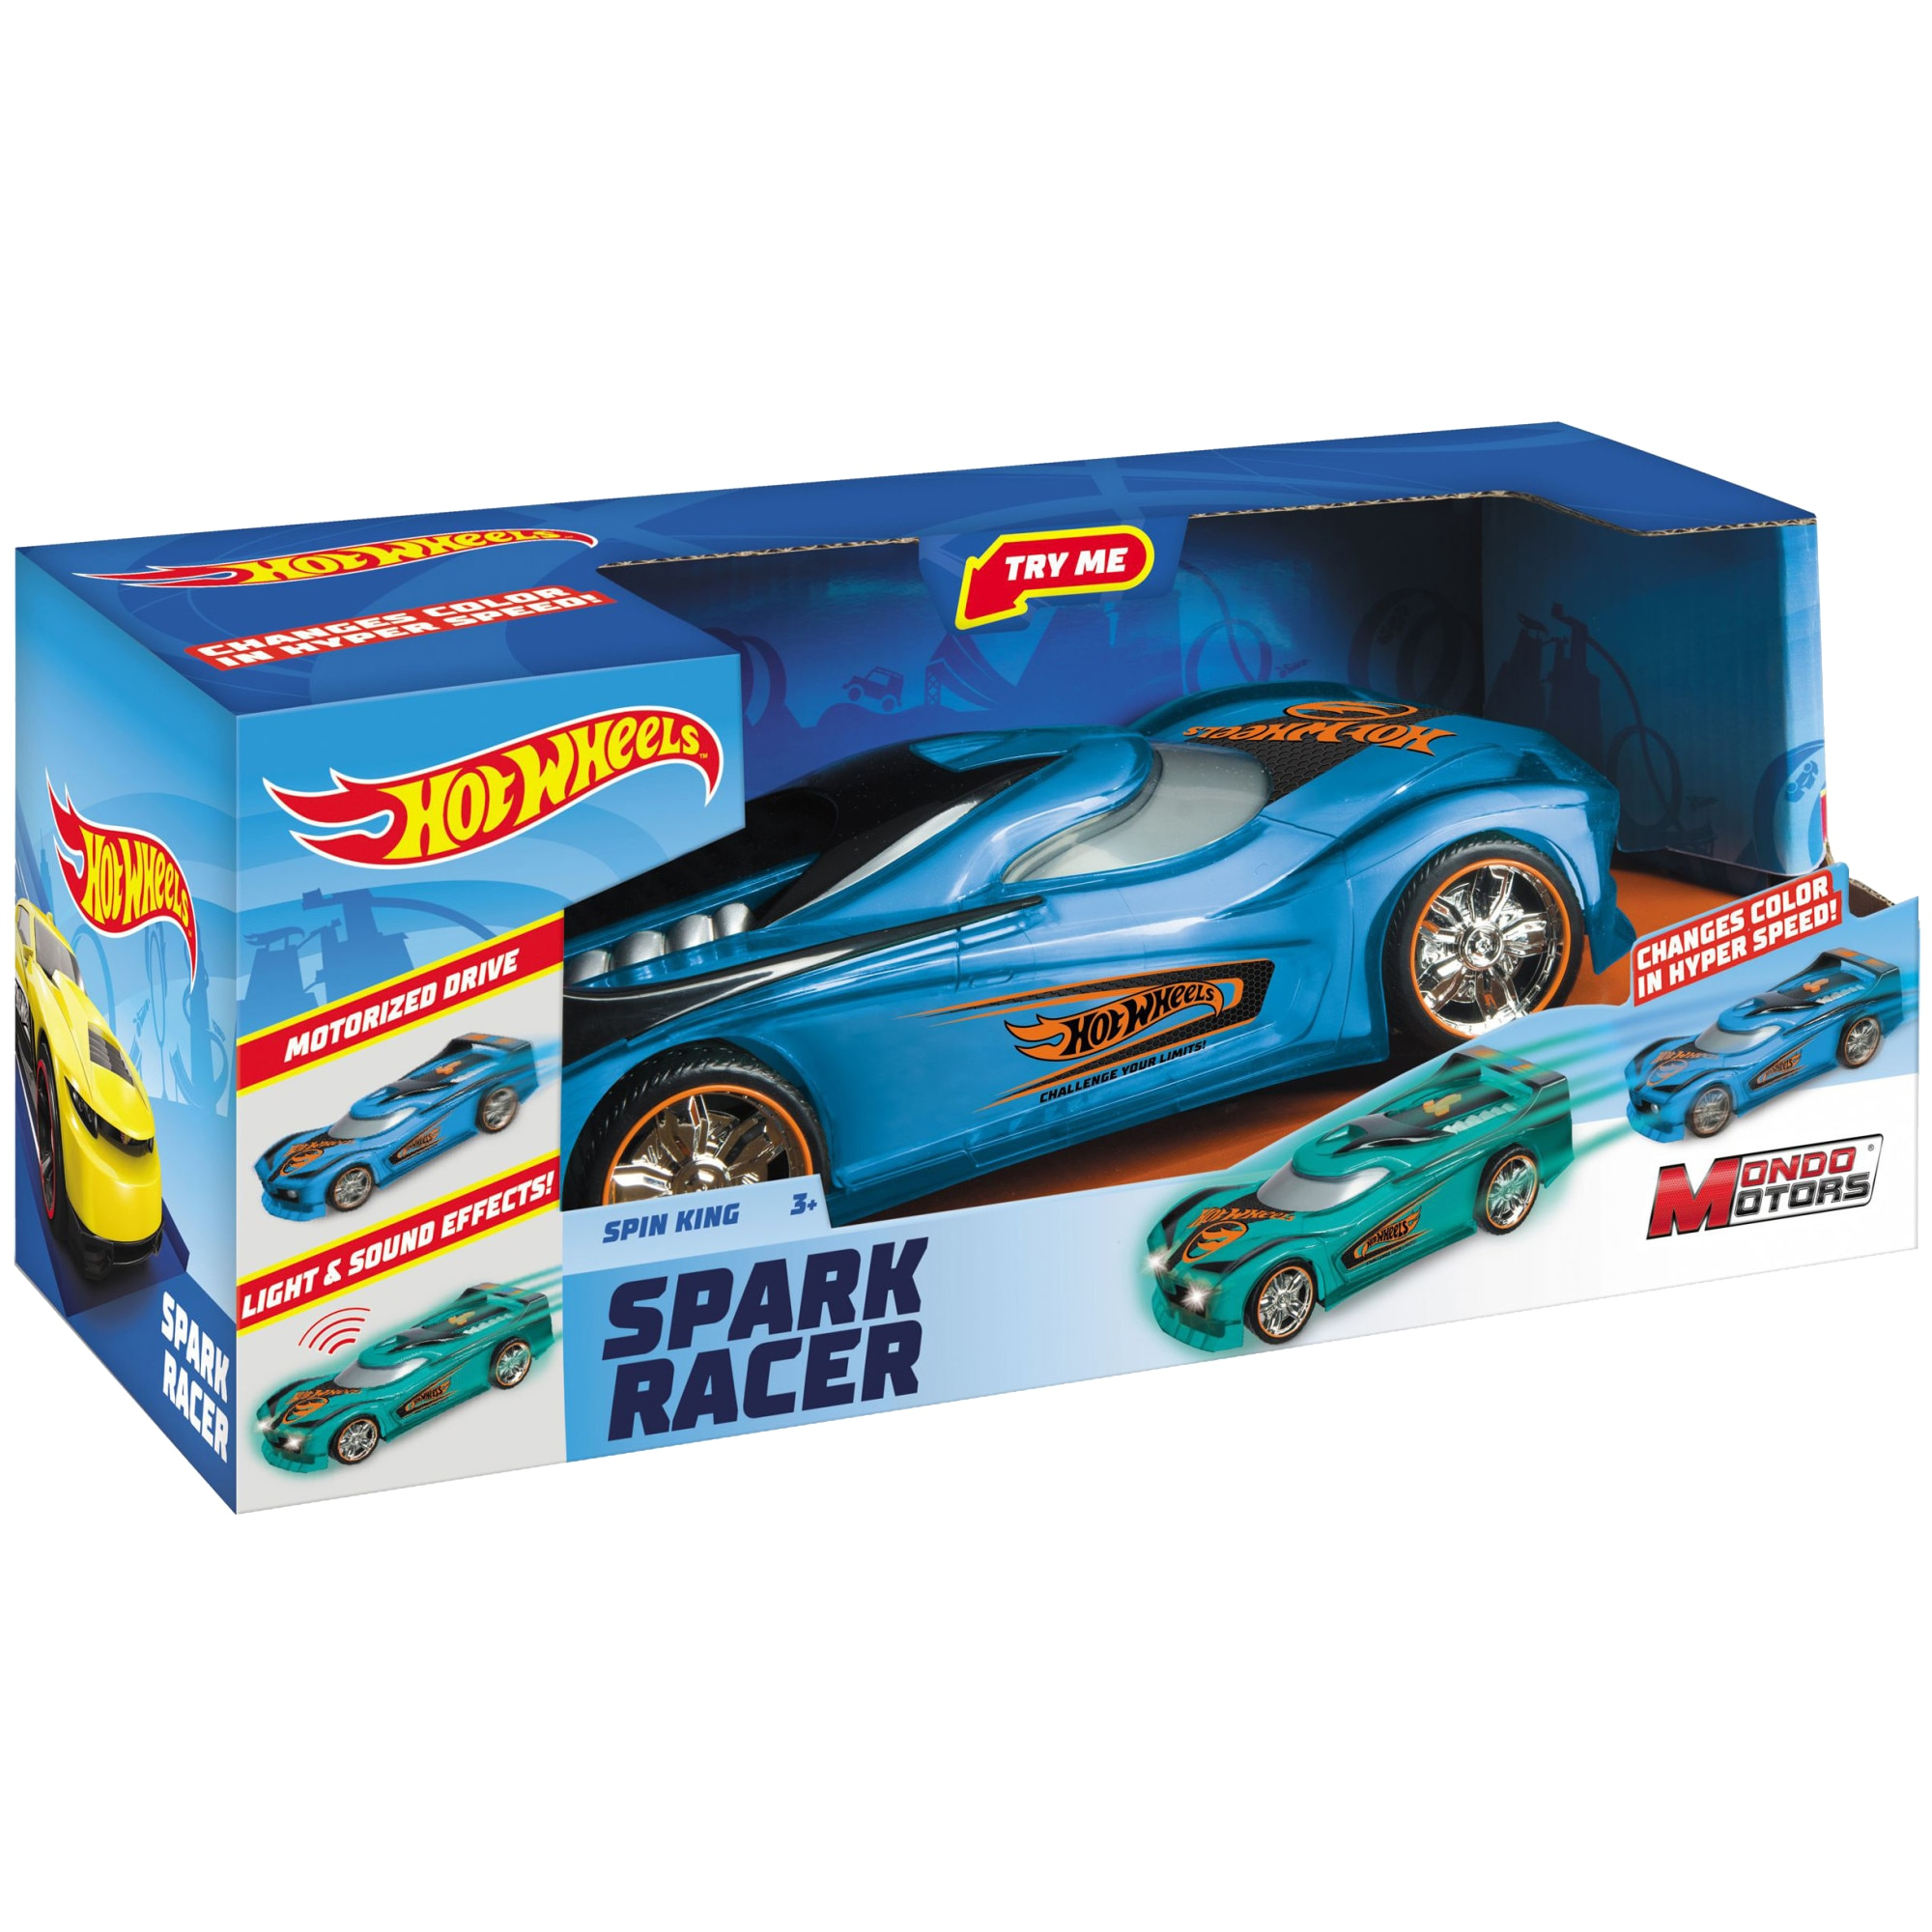 Fotografie Masinuta Hot Wheels Spark Racer - Spin King, cu lumini si sunete